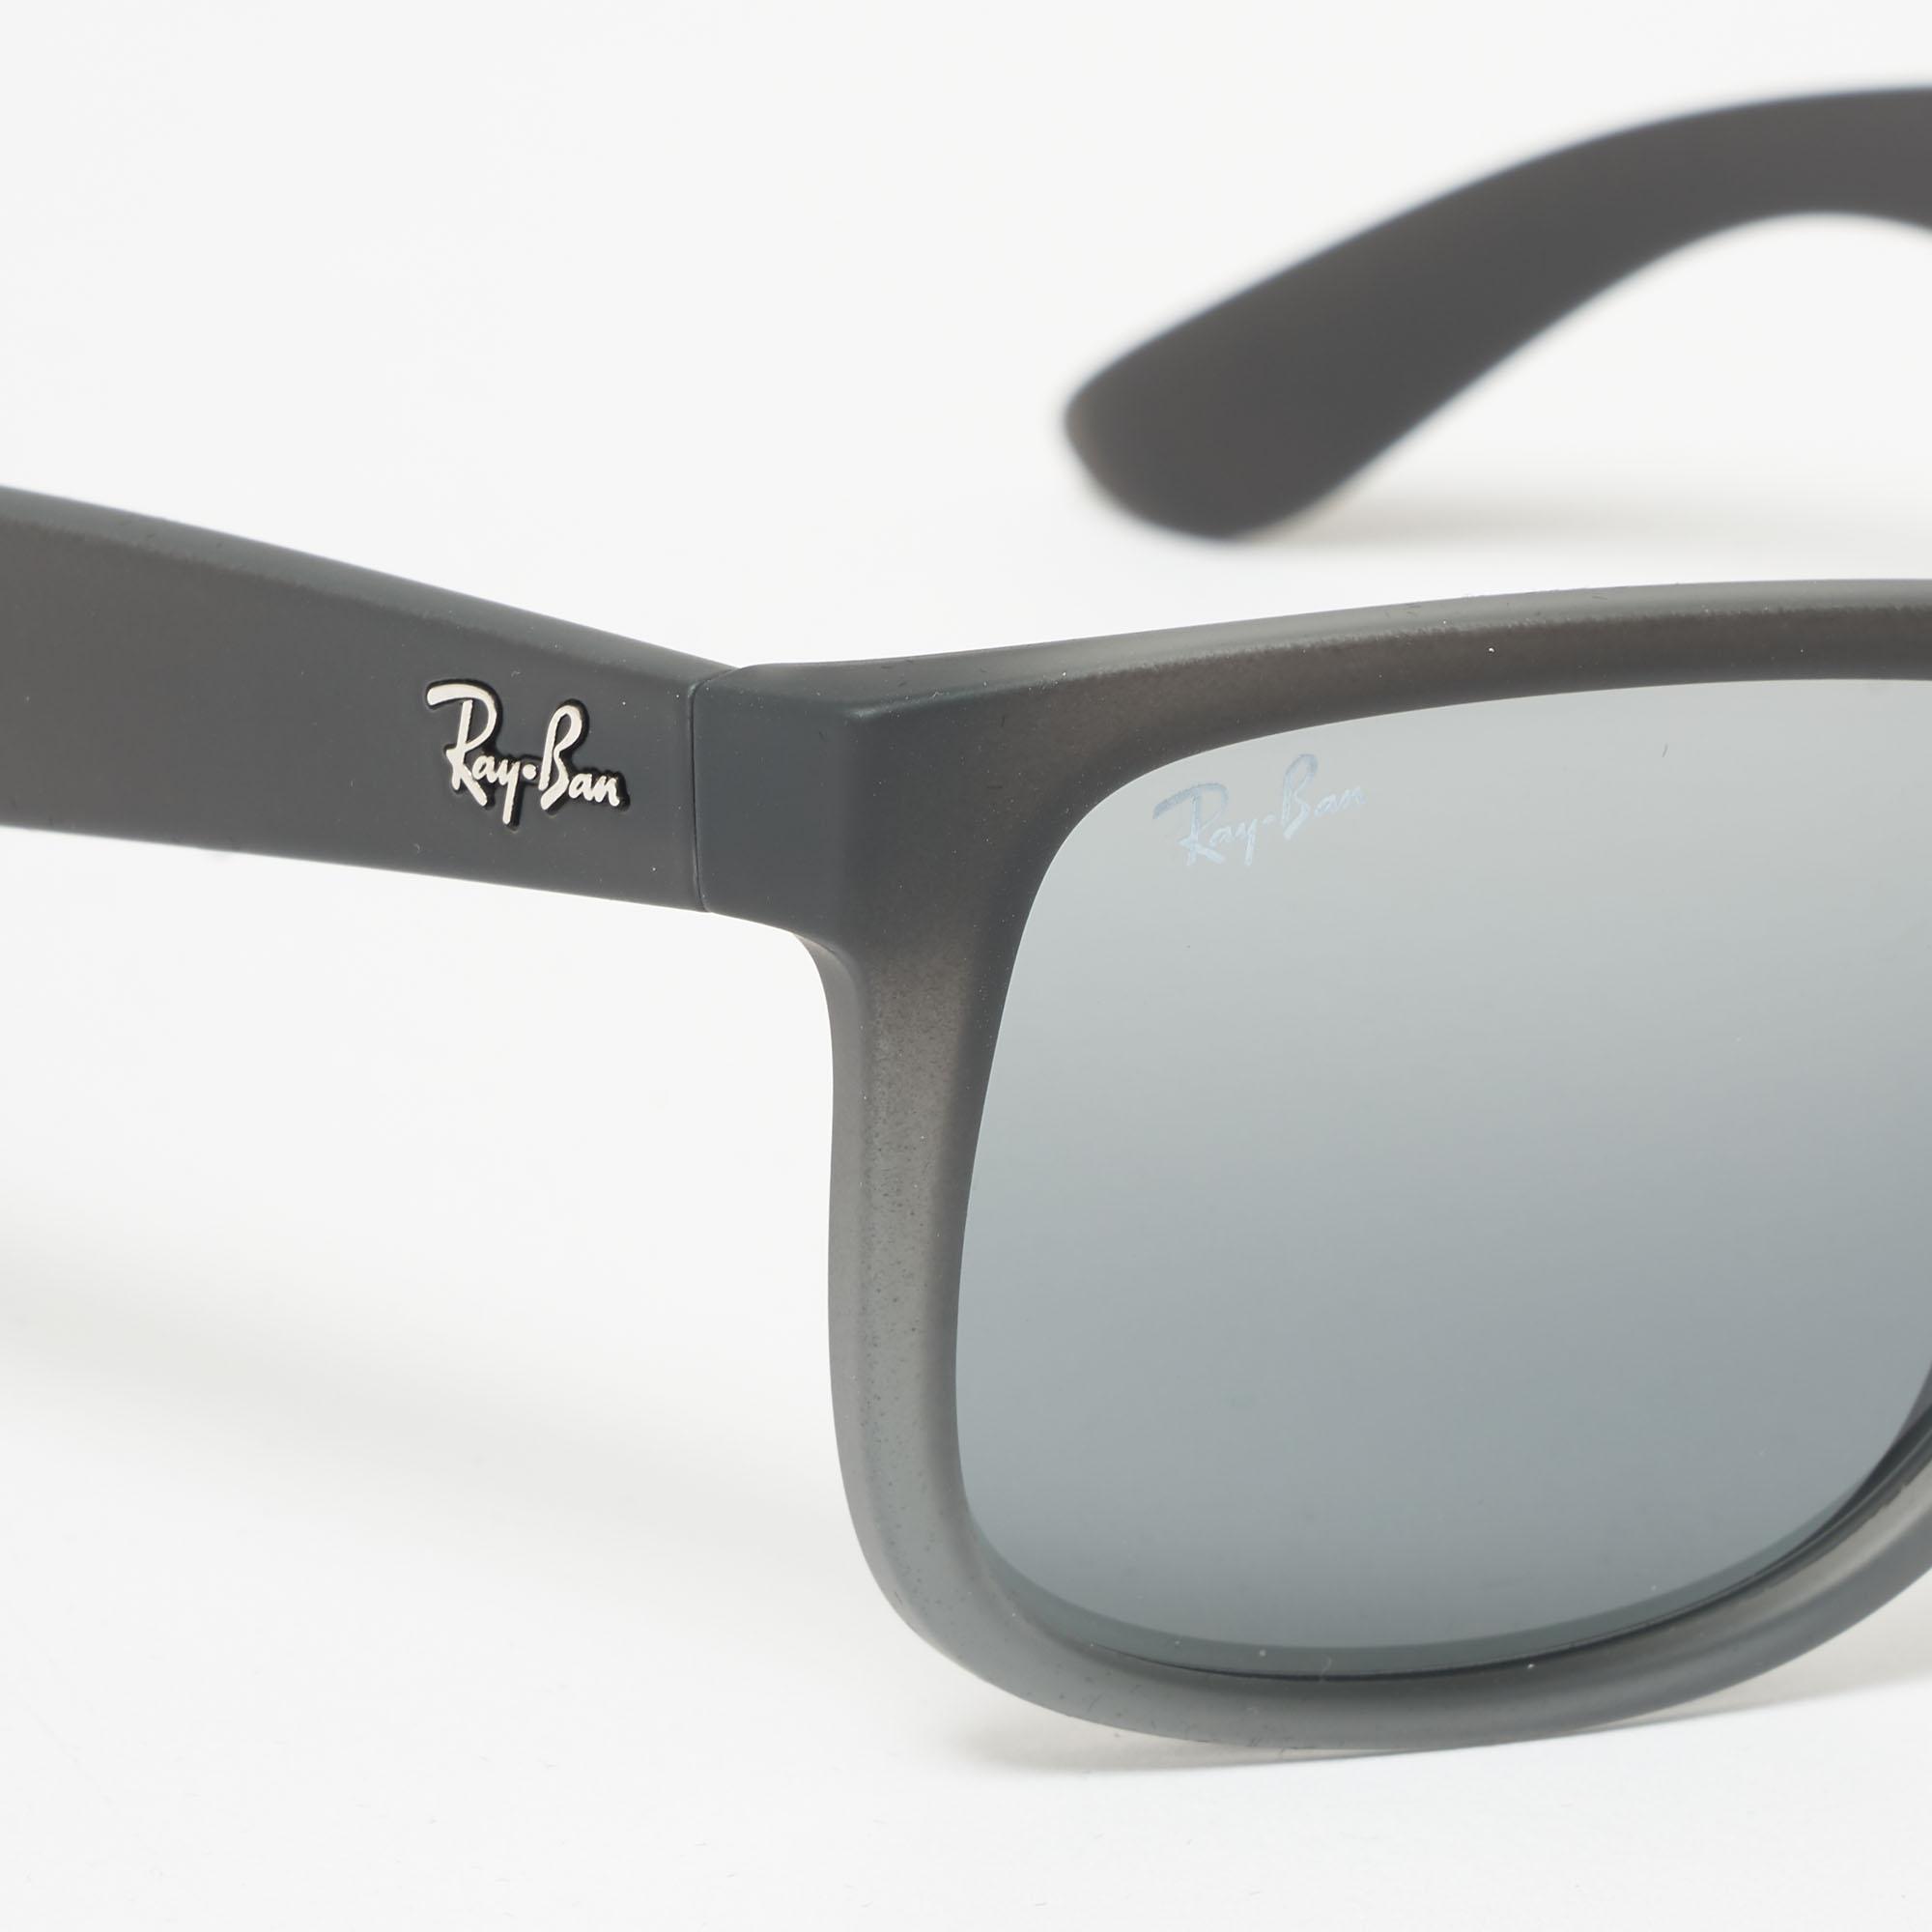 e549067449 ... top quality ray ban metallic justin sunglasses silver gradient mirror  lenses lyst. view fullscreen 6fec4